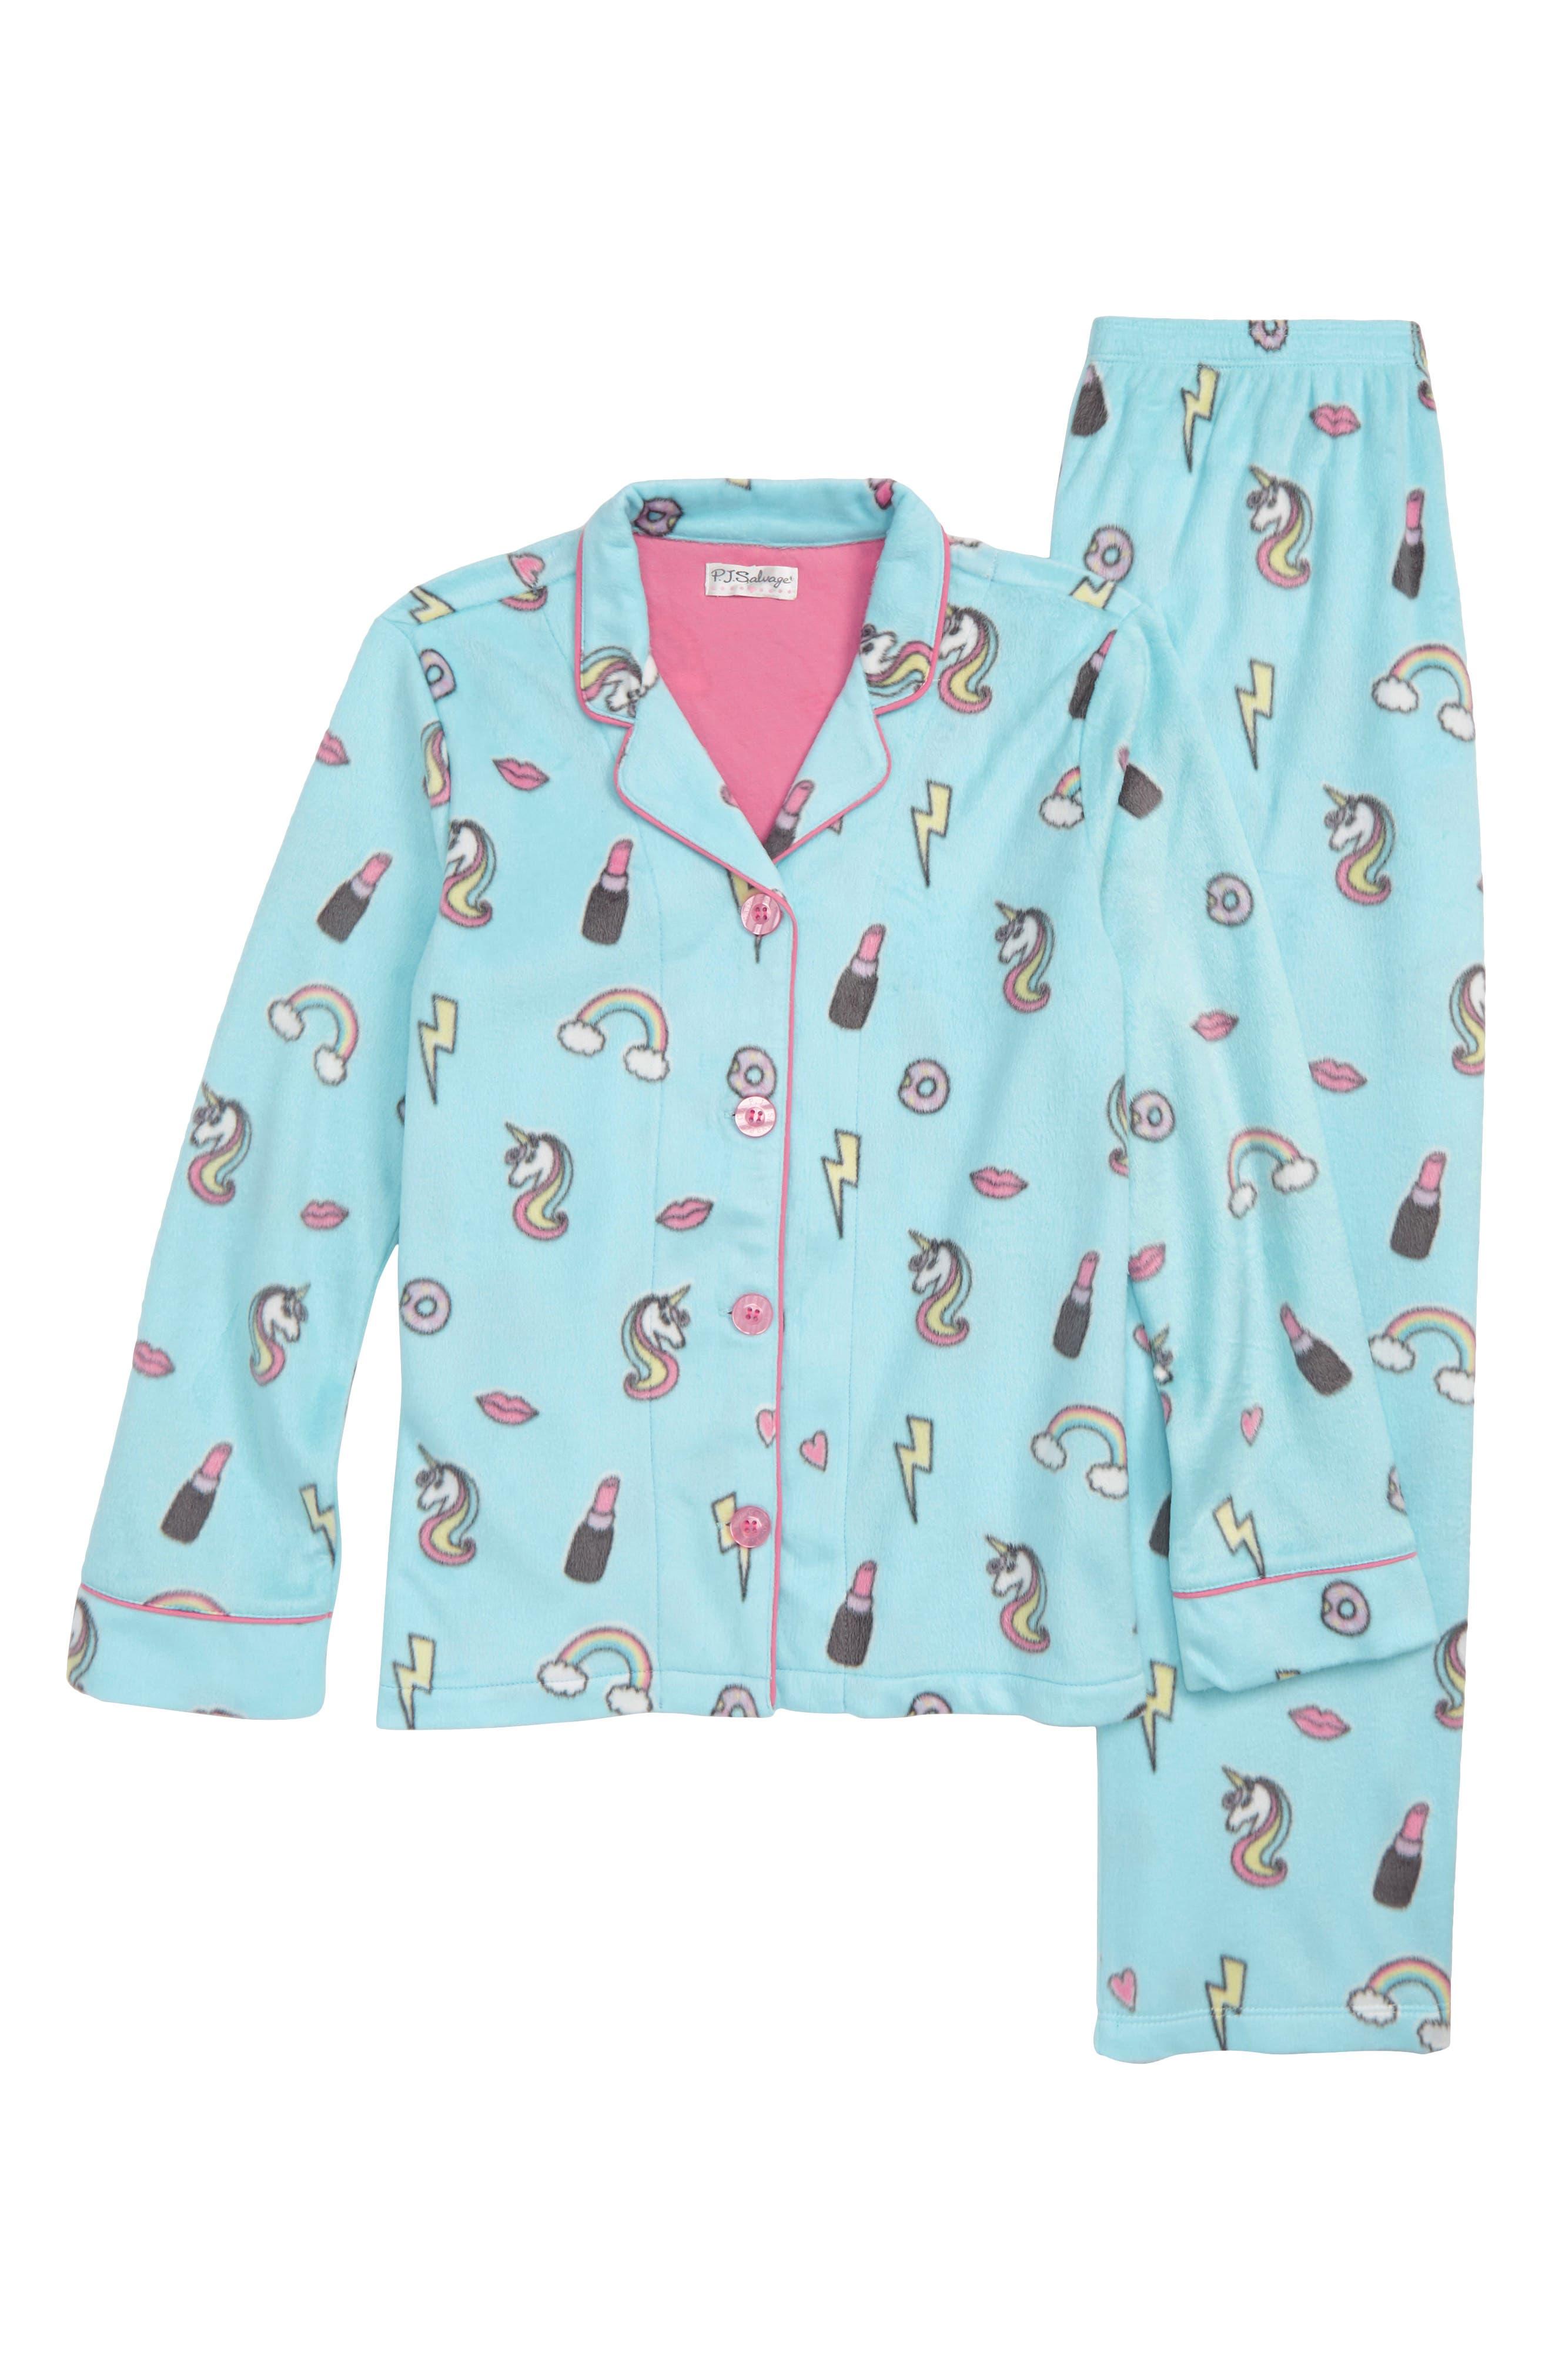 Girl Power Two-Piece Fleece Pajamas,                             Main thumbnail 1, color,                             AQUA